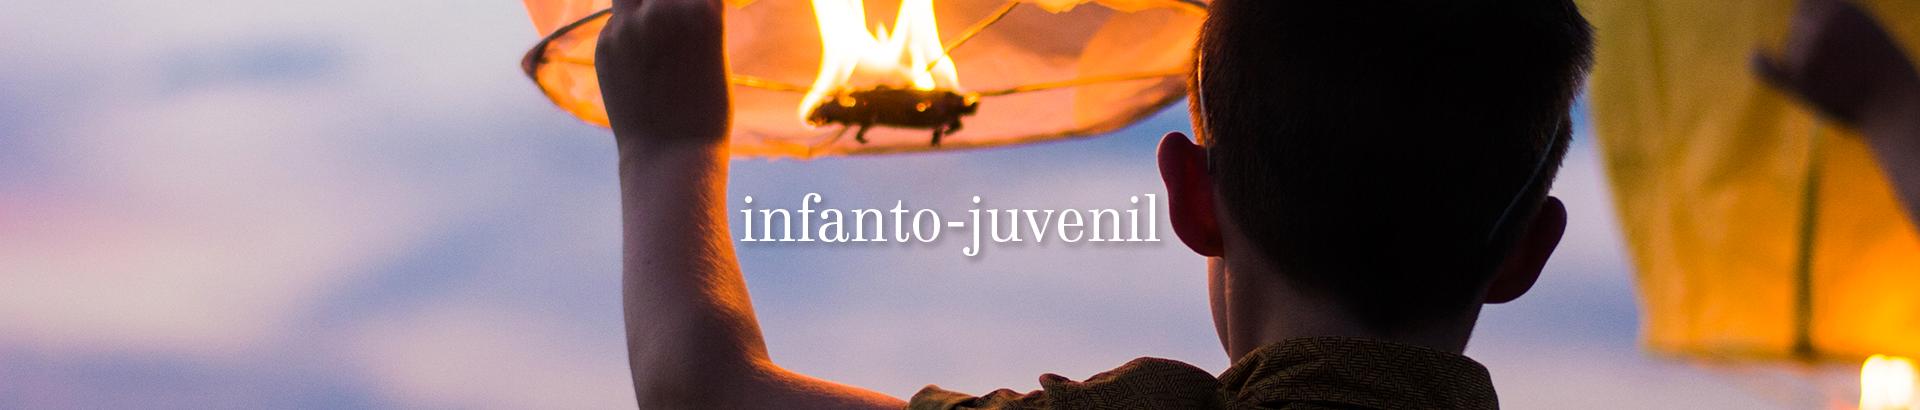 Infanto Juvenil